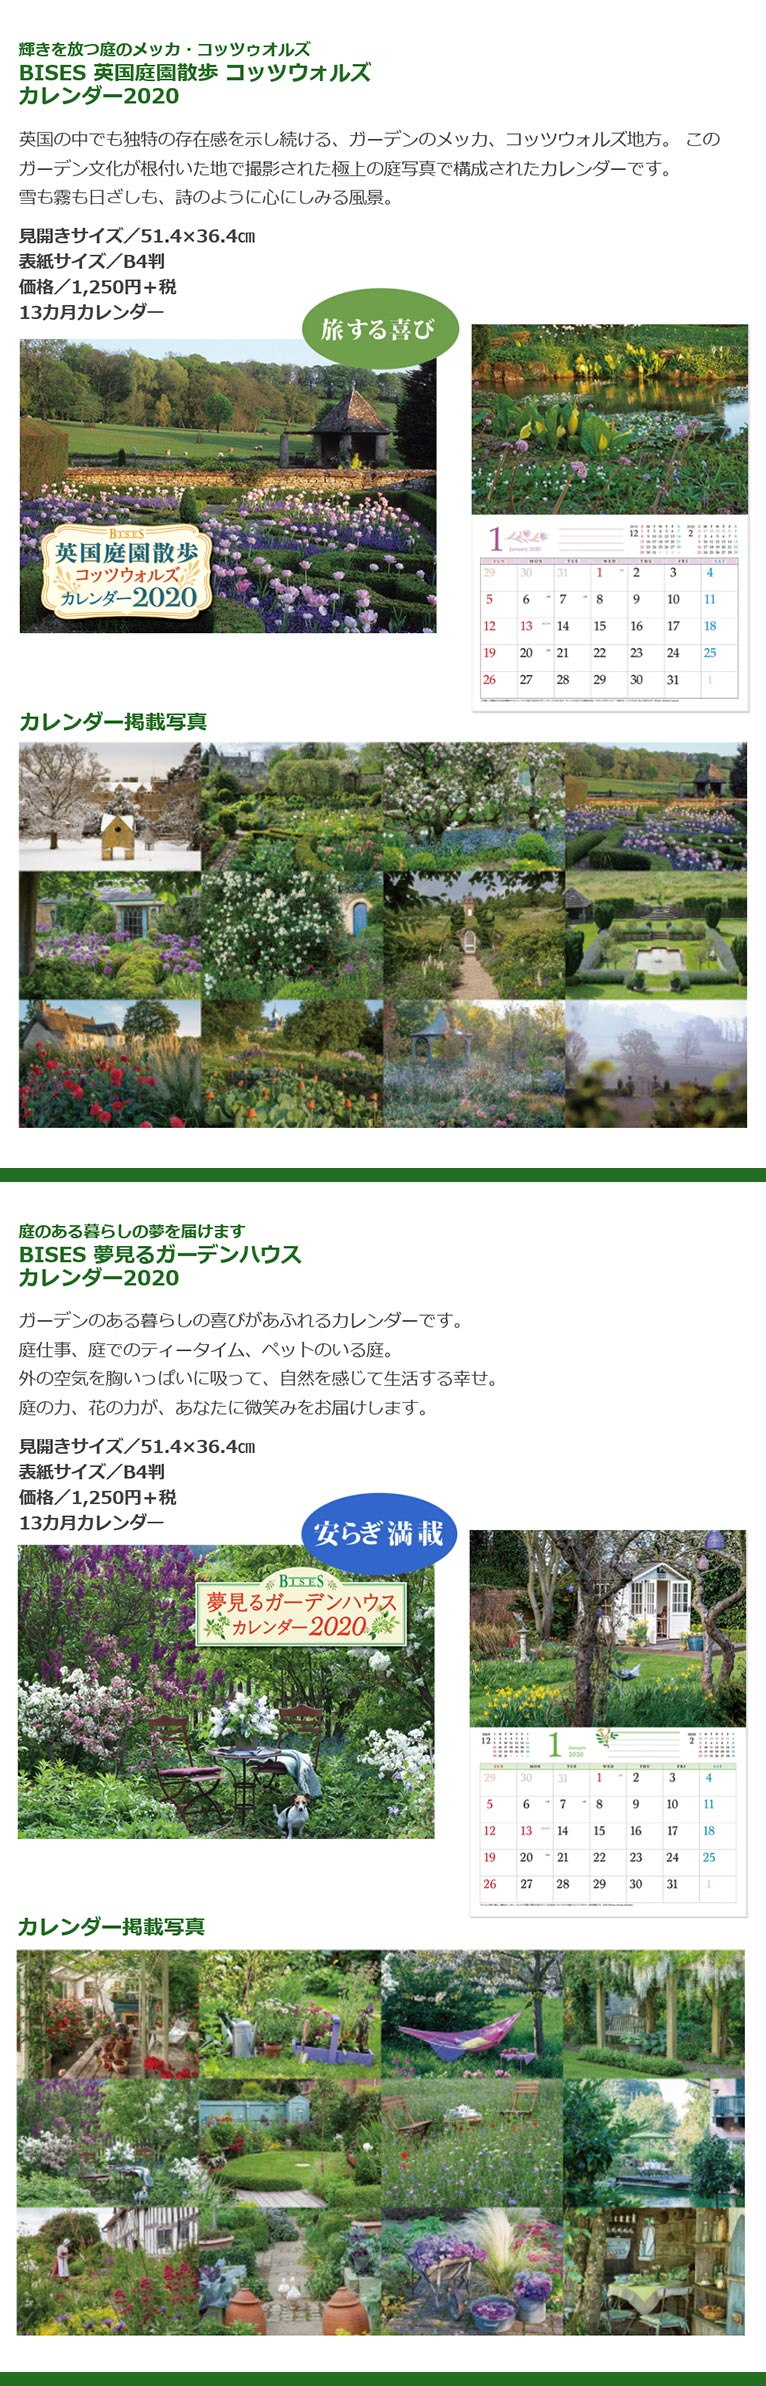 BISESオリジナル2020カレンダー4タイプ発売!